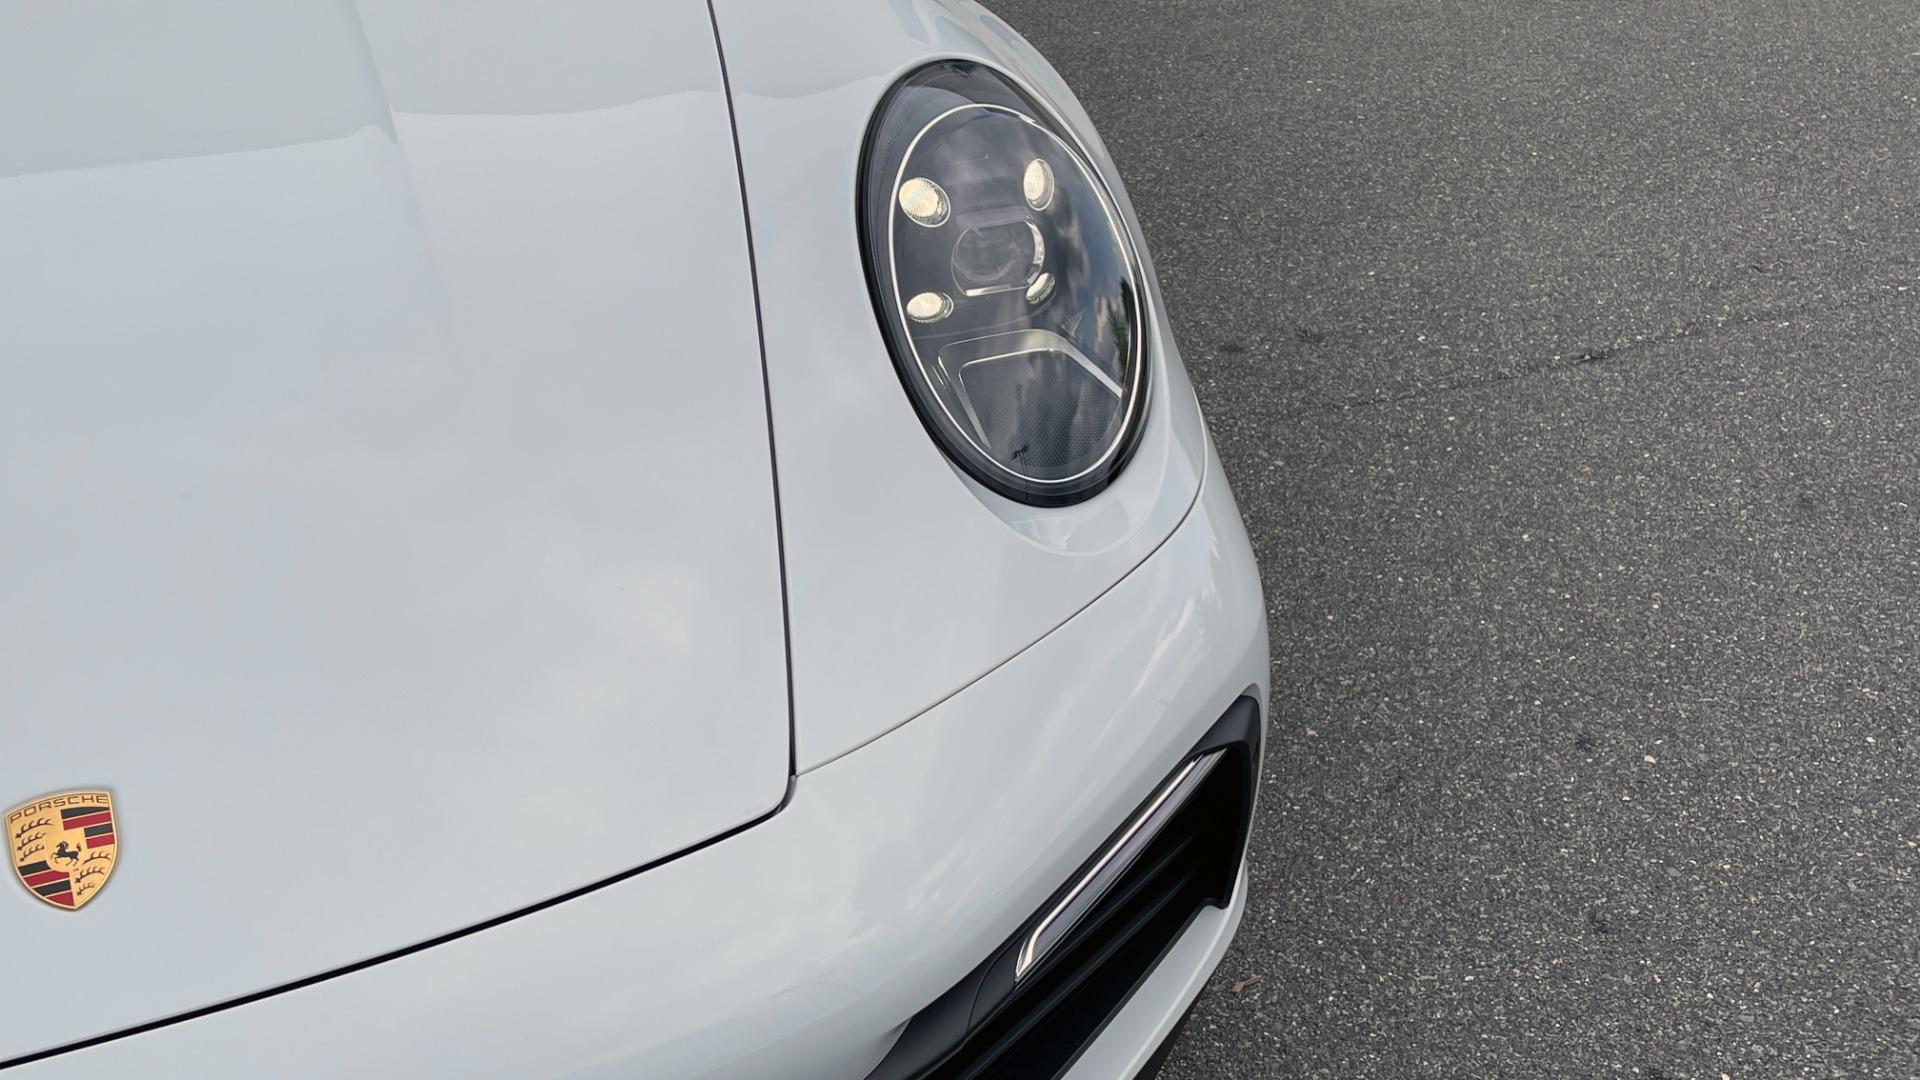 Used 2020 Porsche 911 CARRERA 4S CABRIOLET PREMIUM SPORT PKG / NAV / BOSE / LIGHT DESIGN PKG for sale $167,595 at Formula Imports in Charlotte NC 28227 23